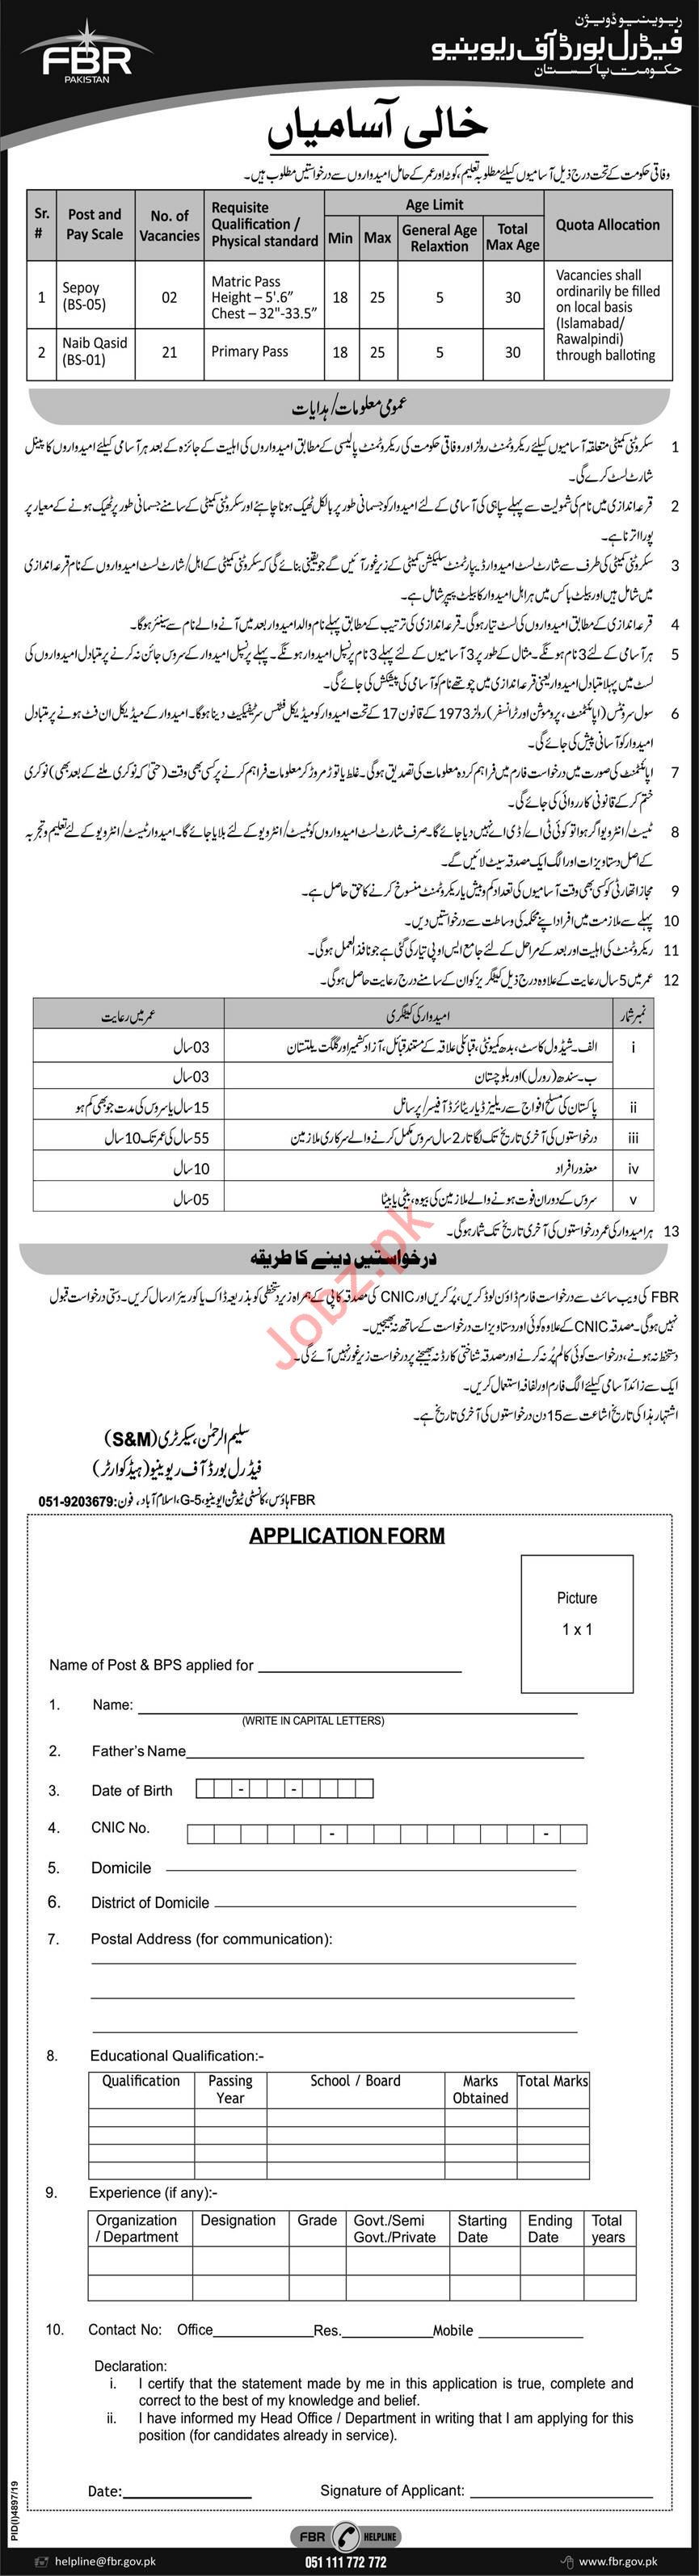 FBR Federal Board of Revenue Jobs 2020 for Naib Qasid